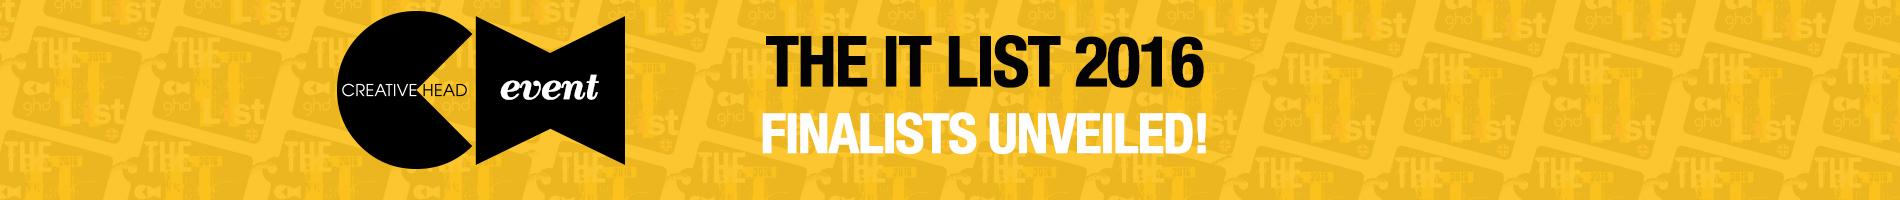 ITL16_finalistsbanner